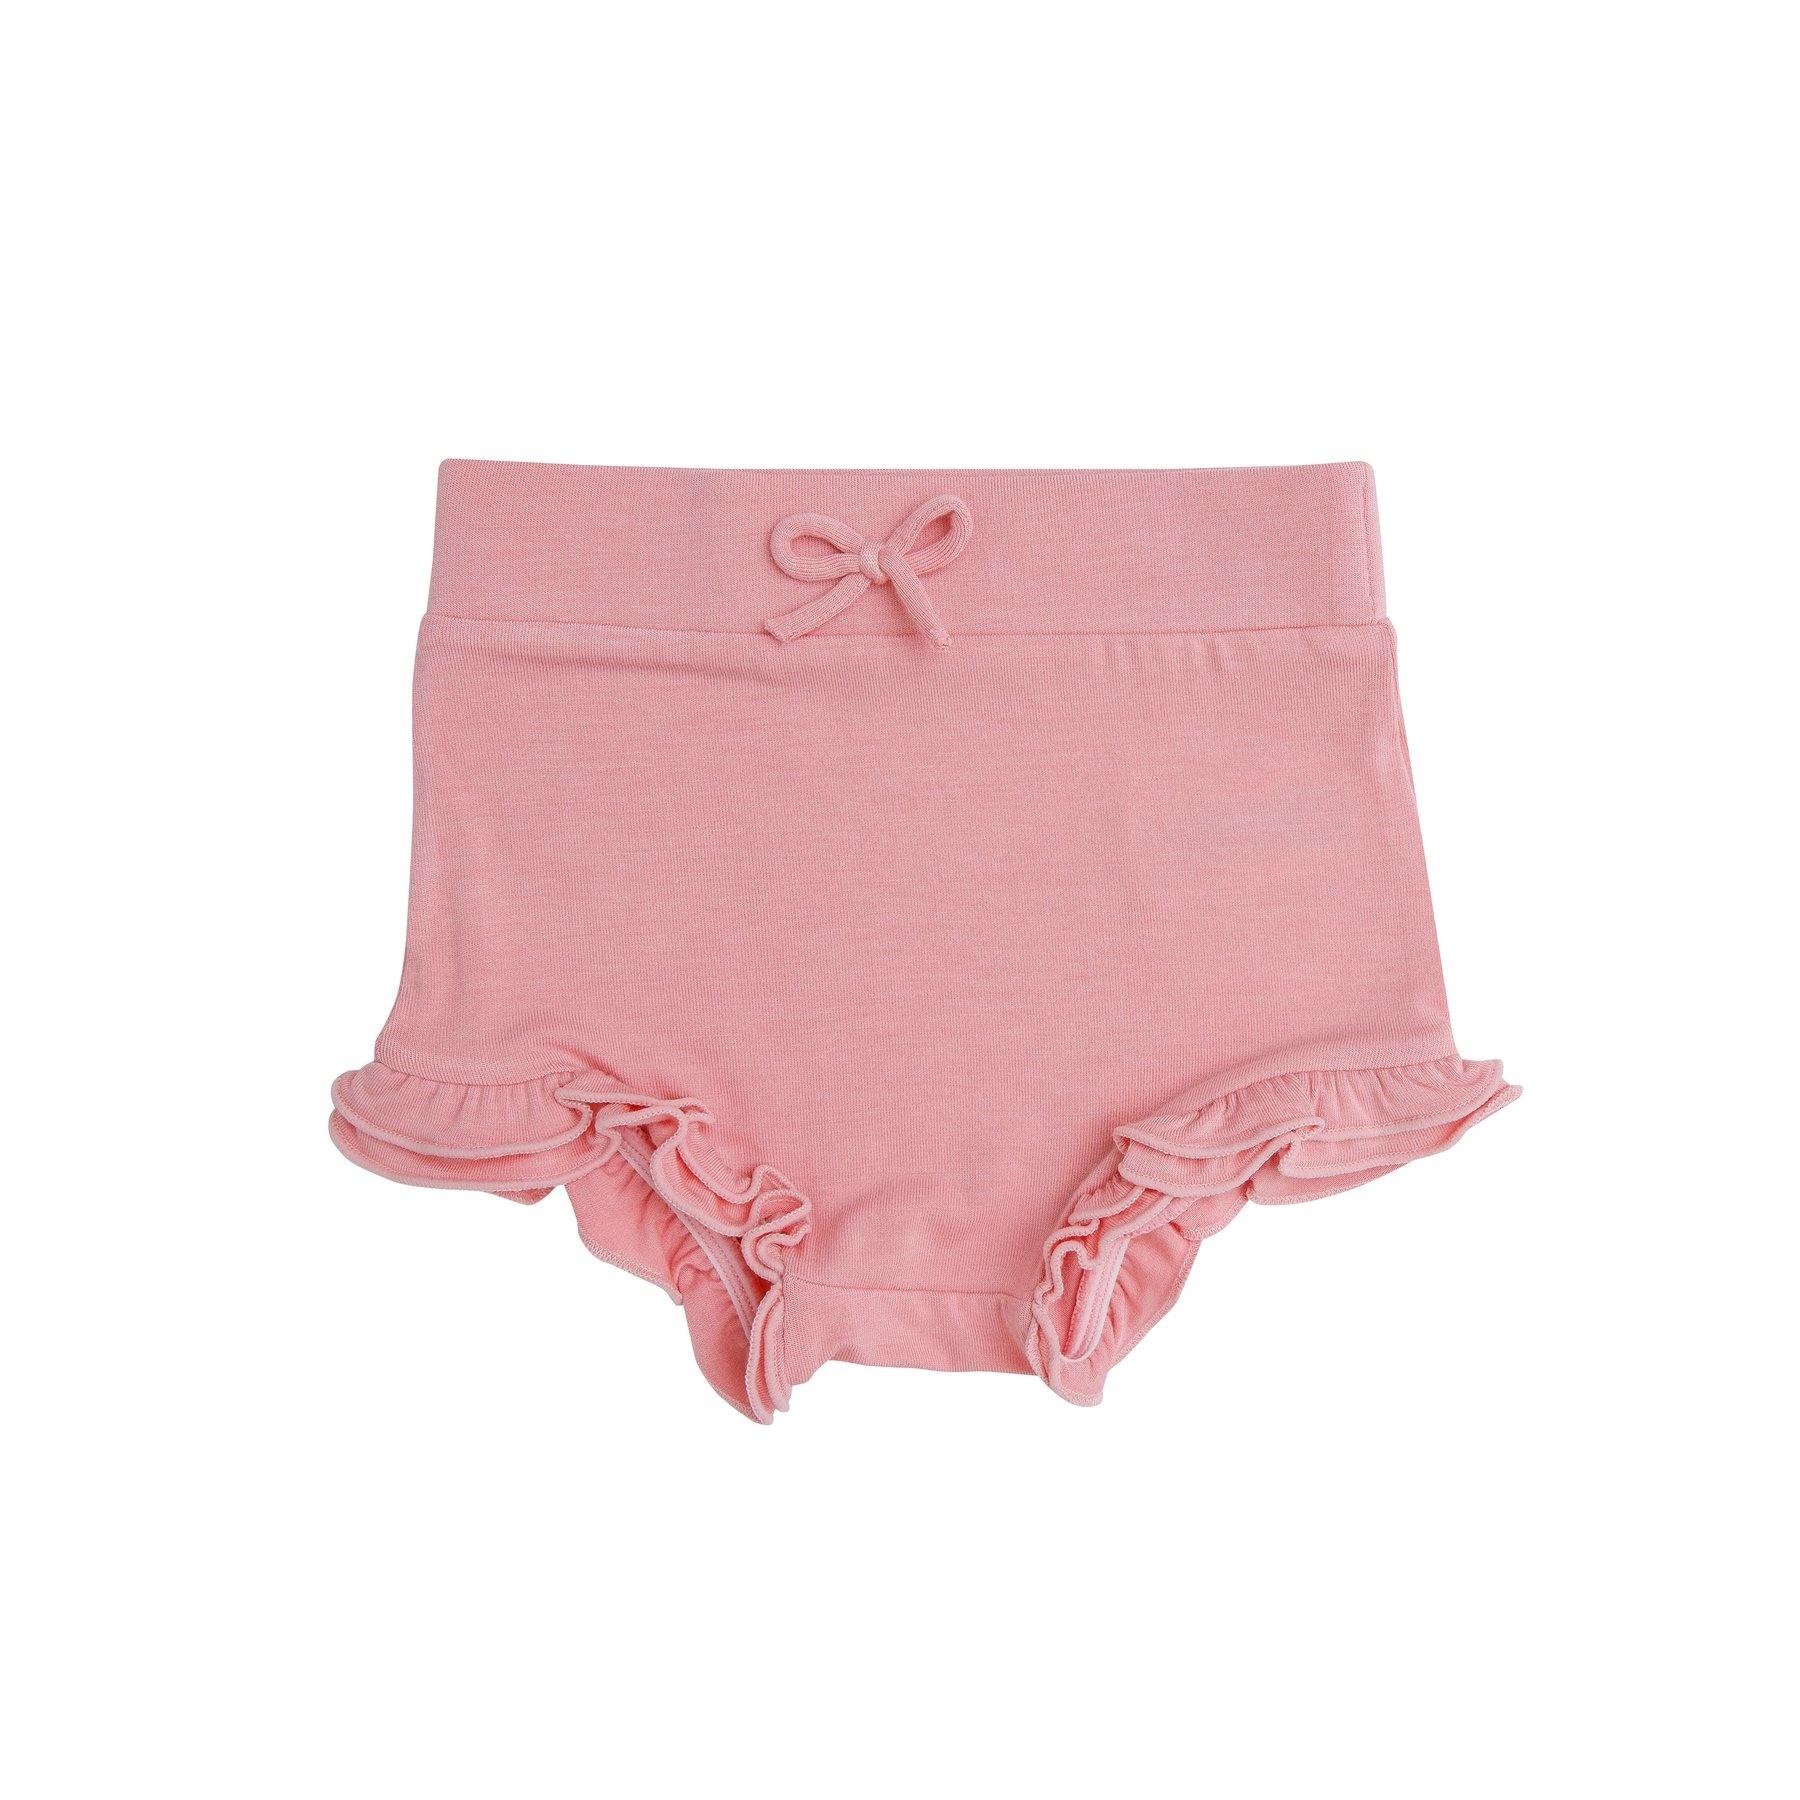 Angel Dear Modern Basics Bamboo High Waist Shorts - Blossom